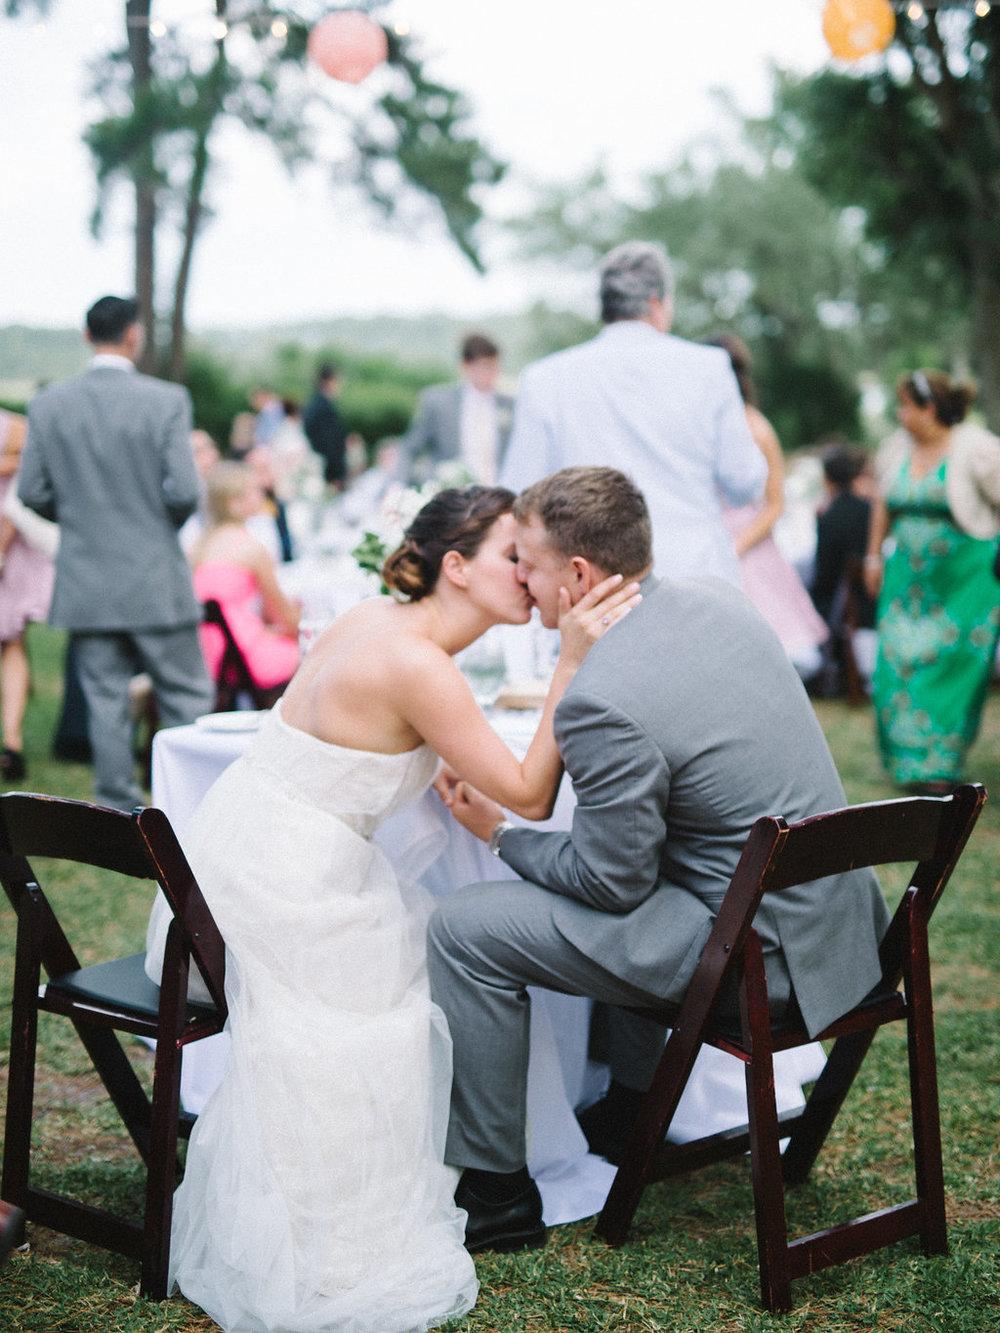 meagan-and-brenden-rach-loves-troy-photography-ivory-and-beau-bridal-boutqiue-ti-adora-wedding-dress-gold-lace-wedding-dress-savannah-wedding-planner-savannah-weddings-oldfield-plantation-wedding-savannah-florist-50.jpg